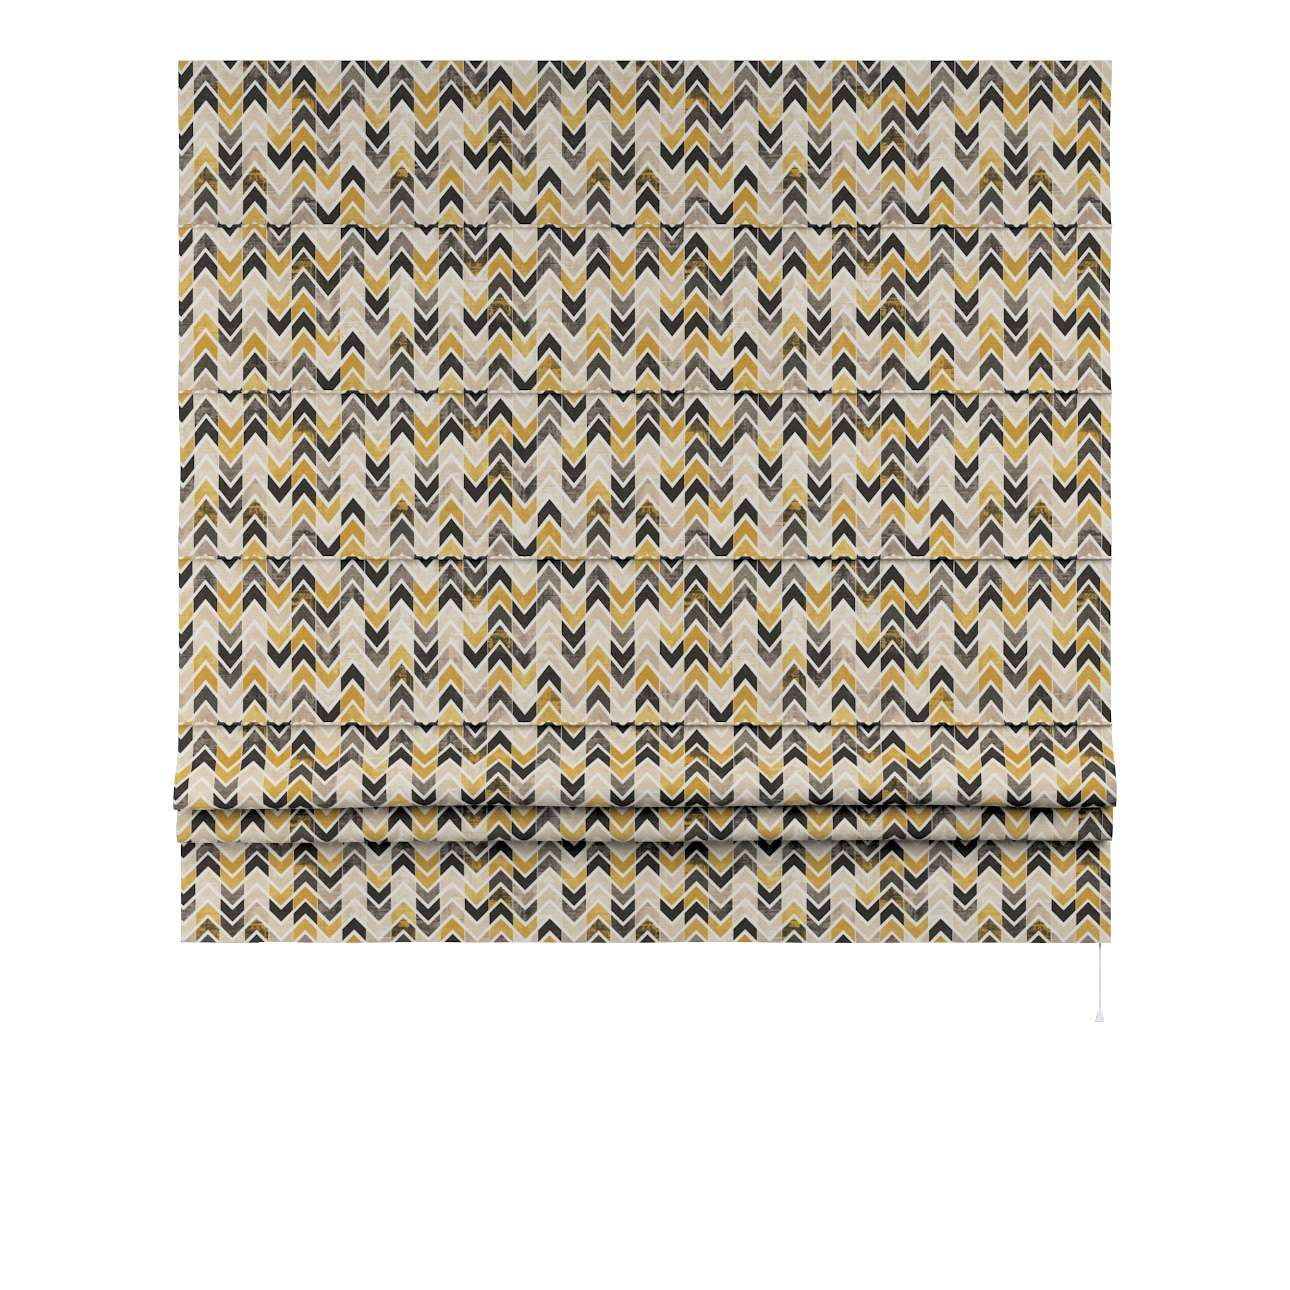 Roleta rzymska Padva w kolekcji Modern, tkanina: 142-79